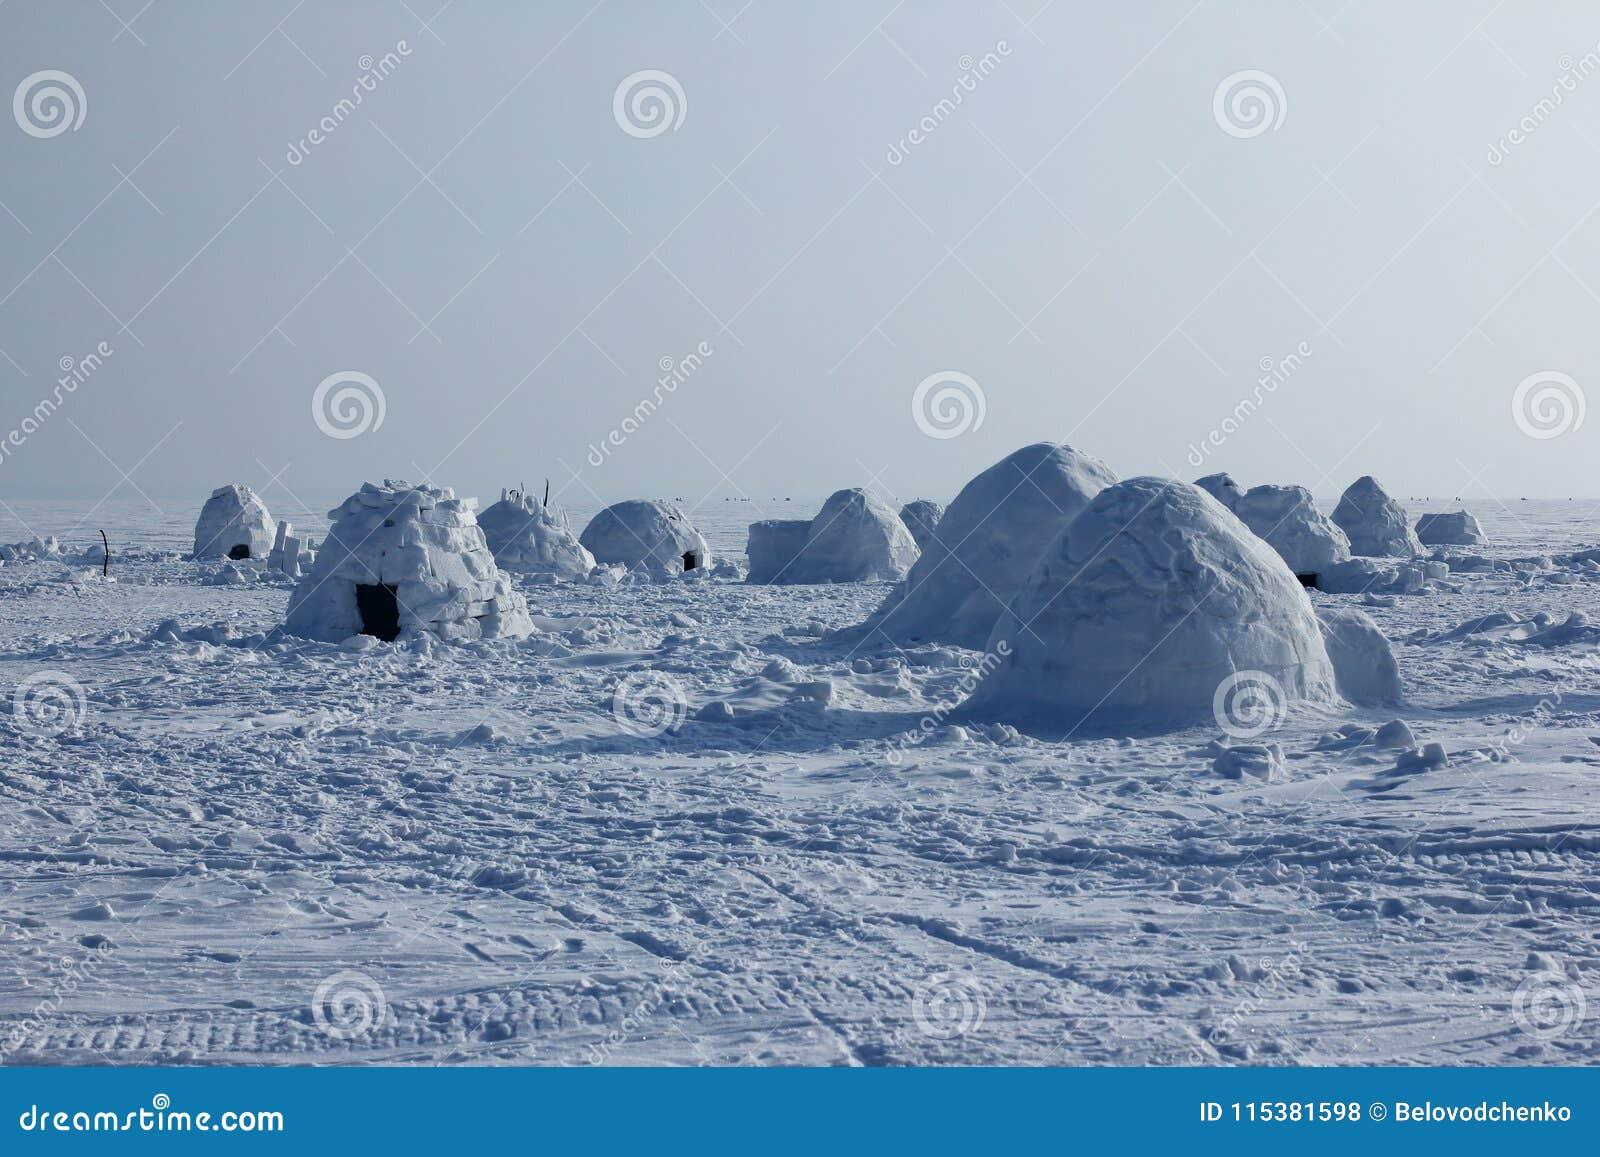 Igloo. Eskimos Village. Stock Photo. Image Of Night